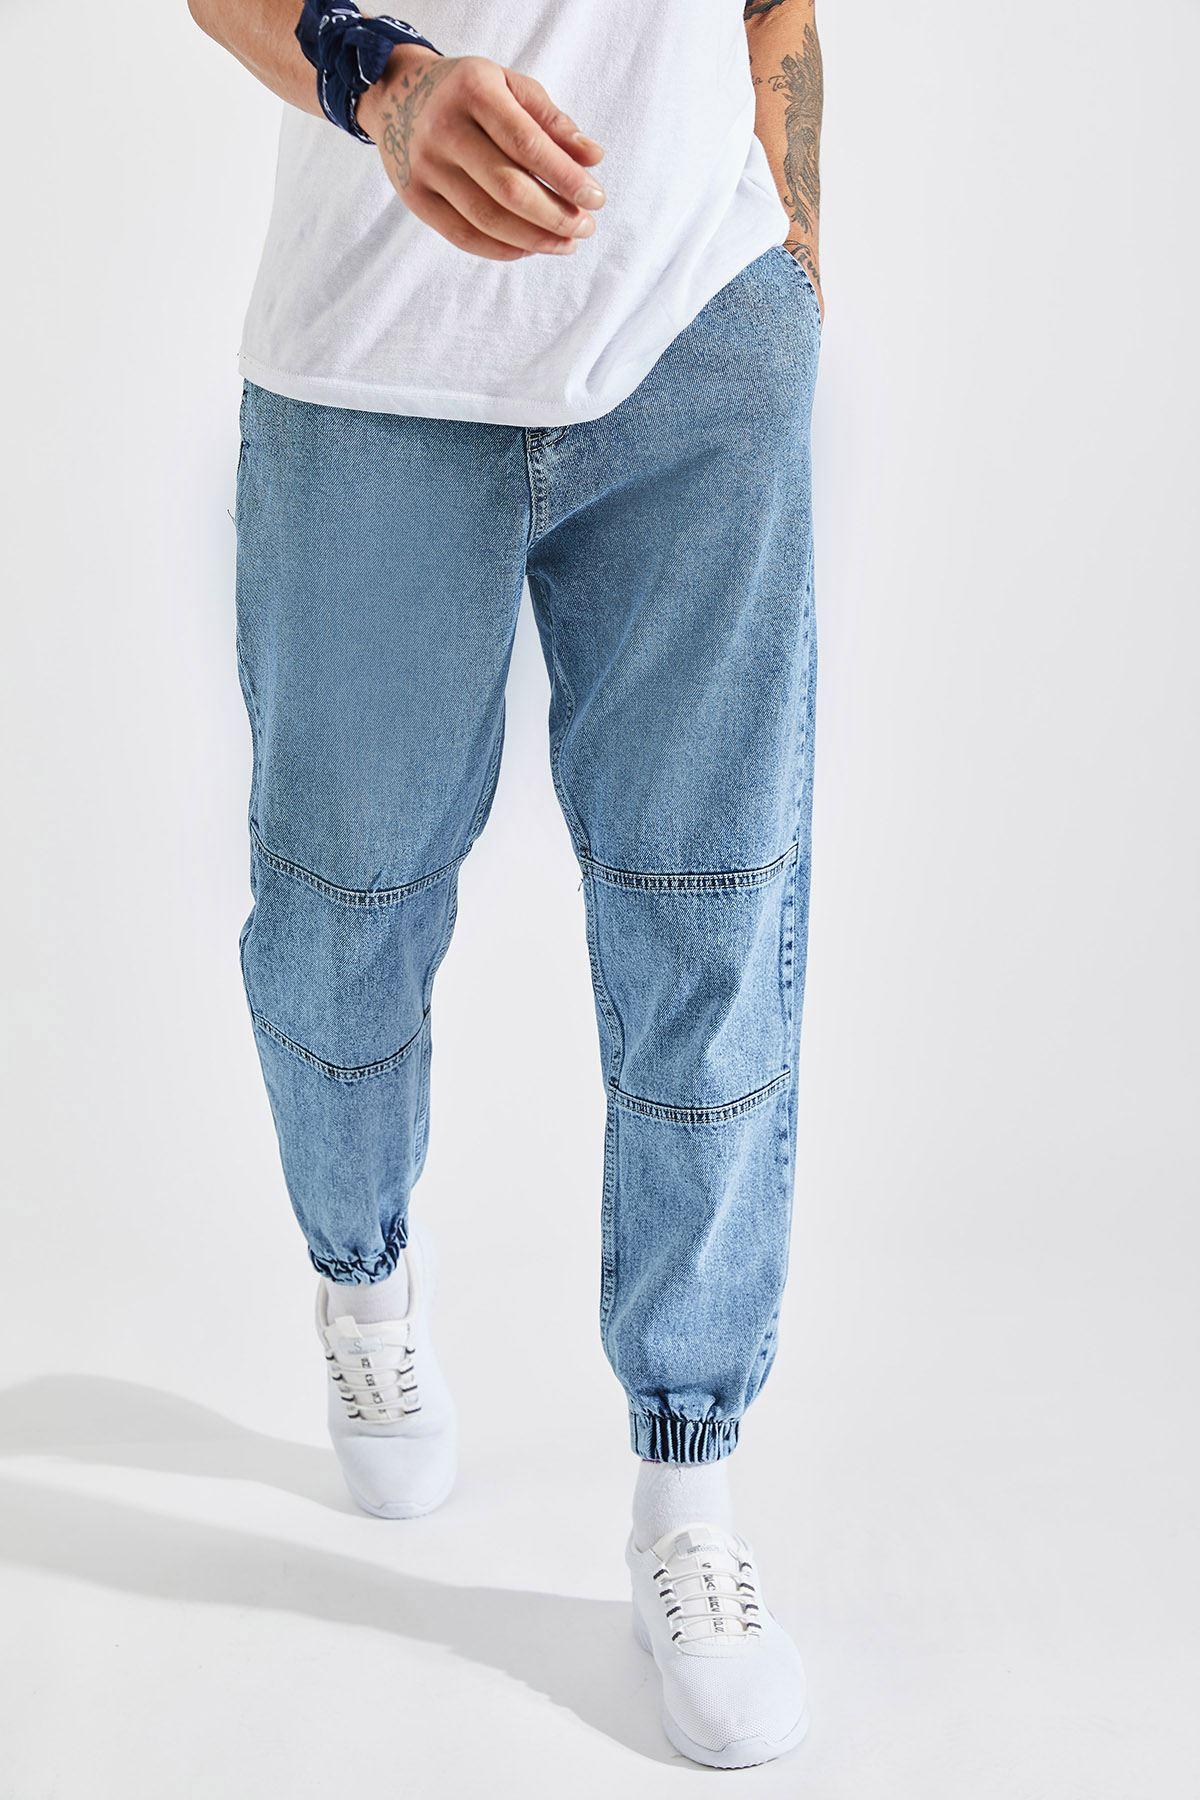 Erkek Paça Lastikli Kar Yıkama Kot Pantolon